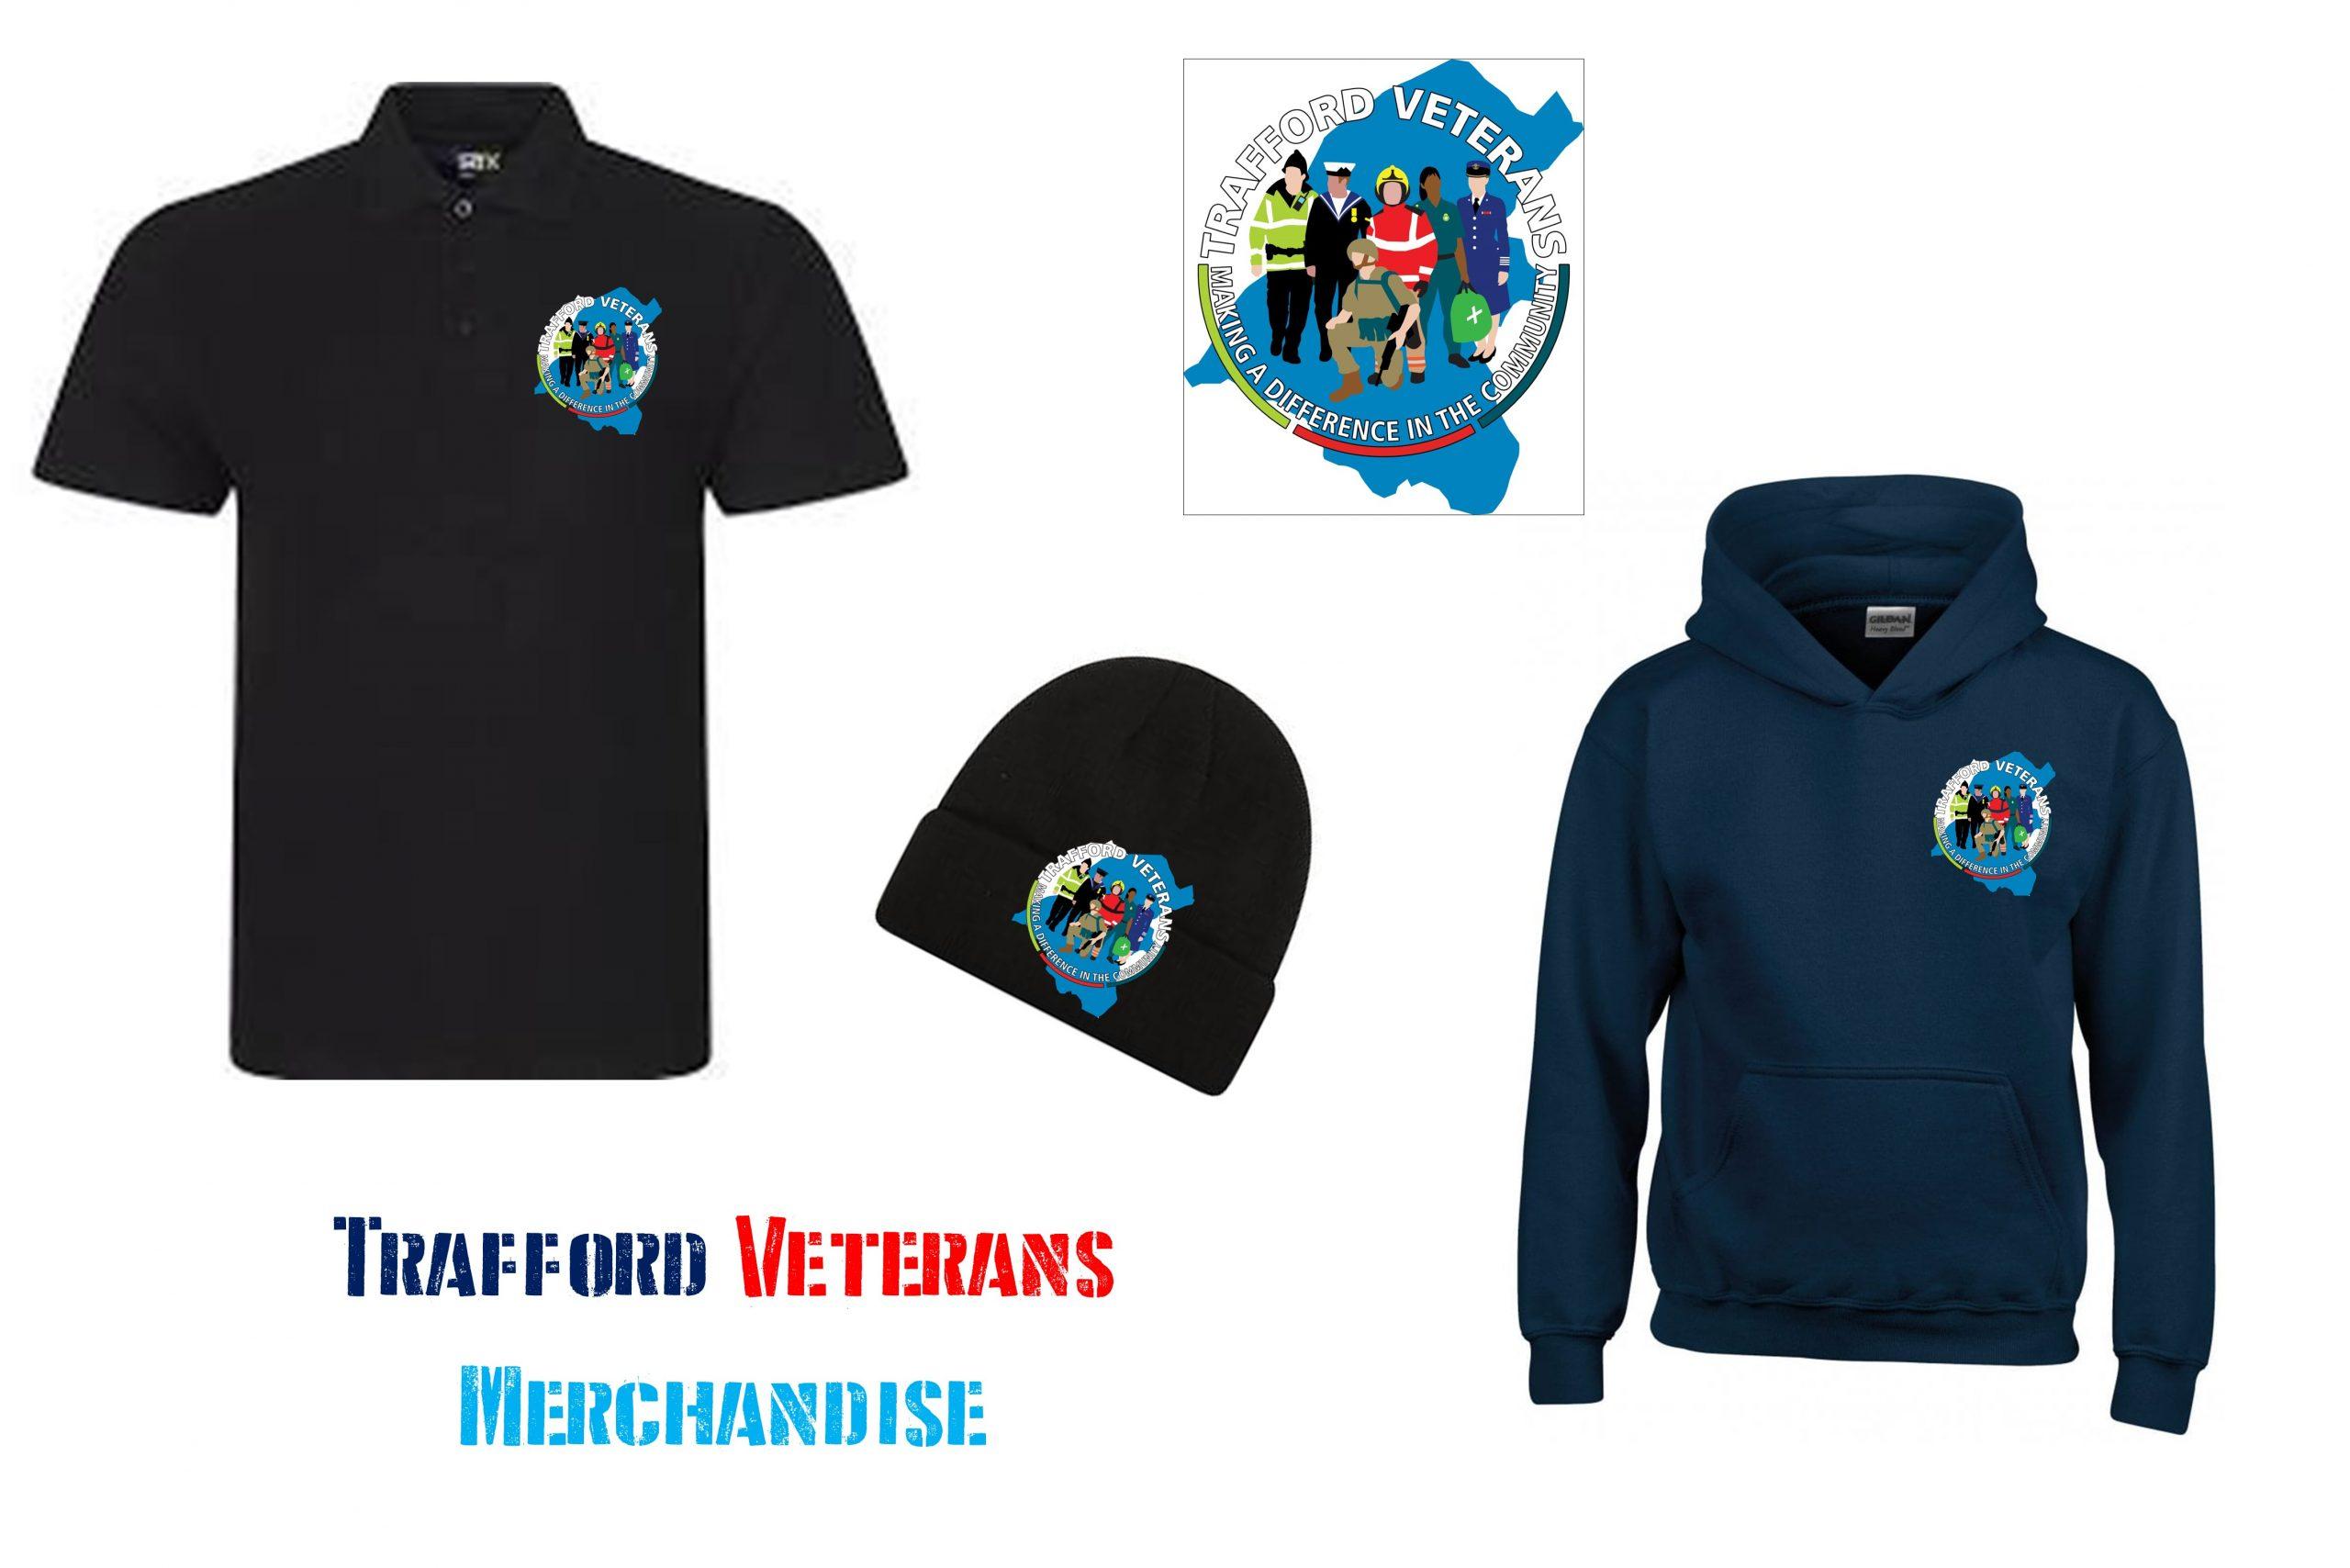 Trafford Veterans Merchandise